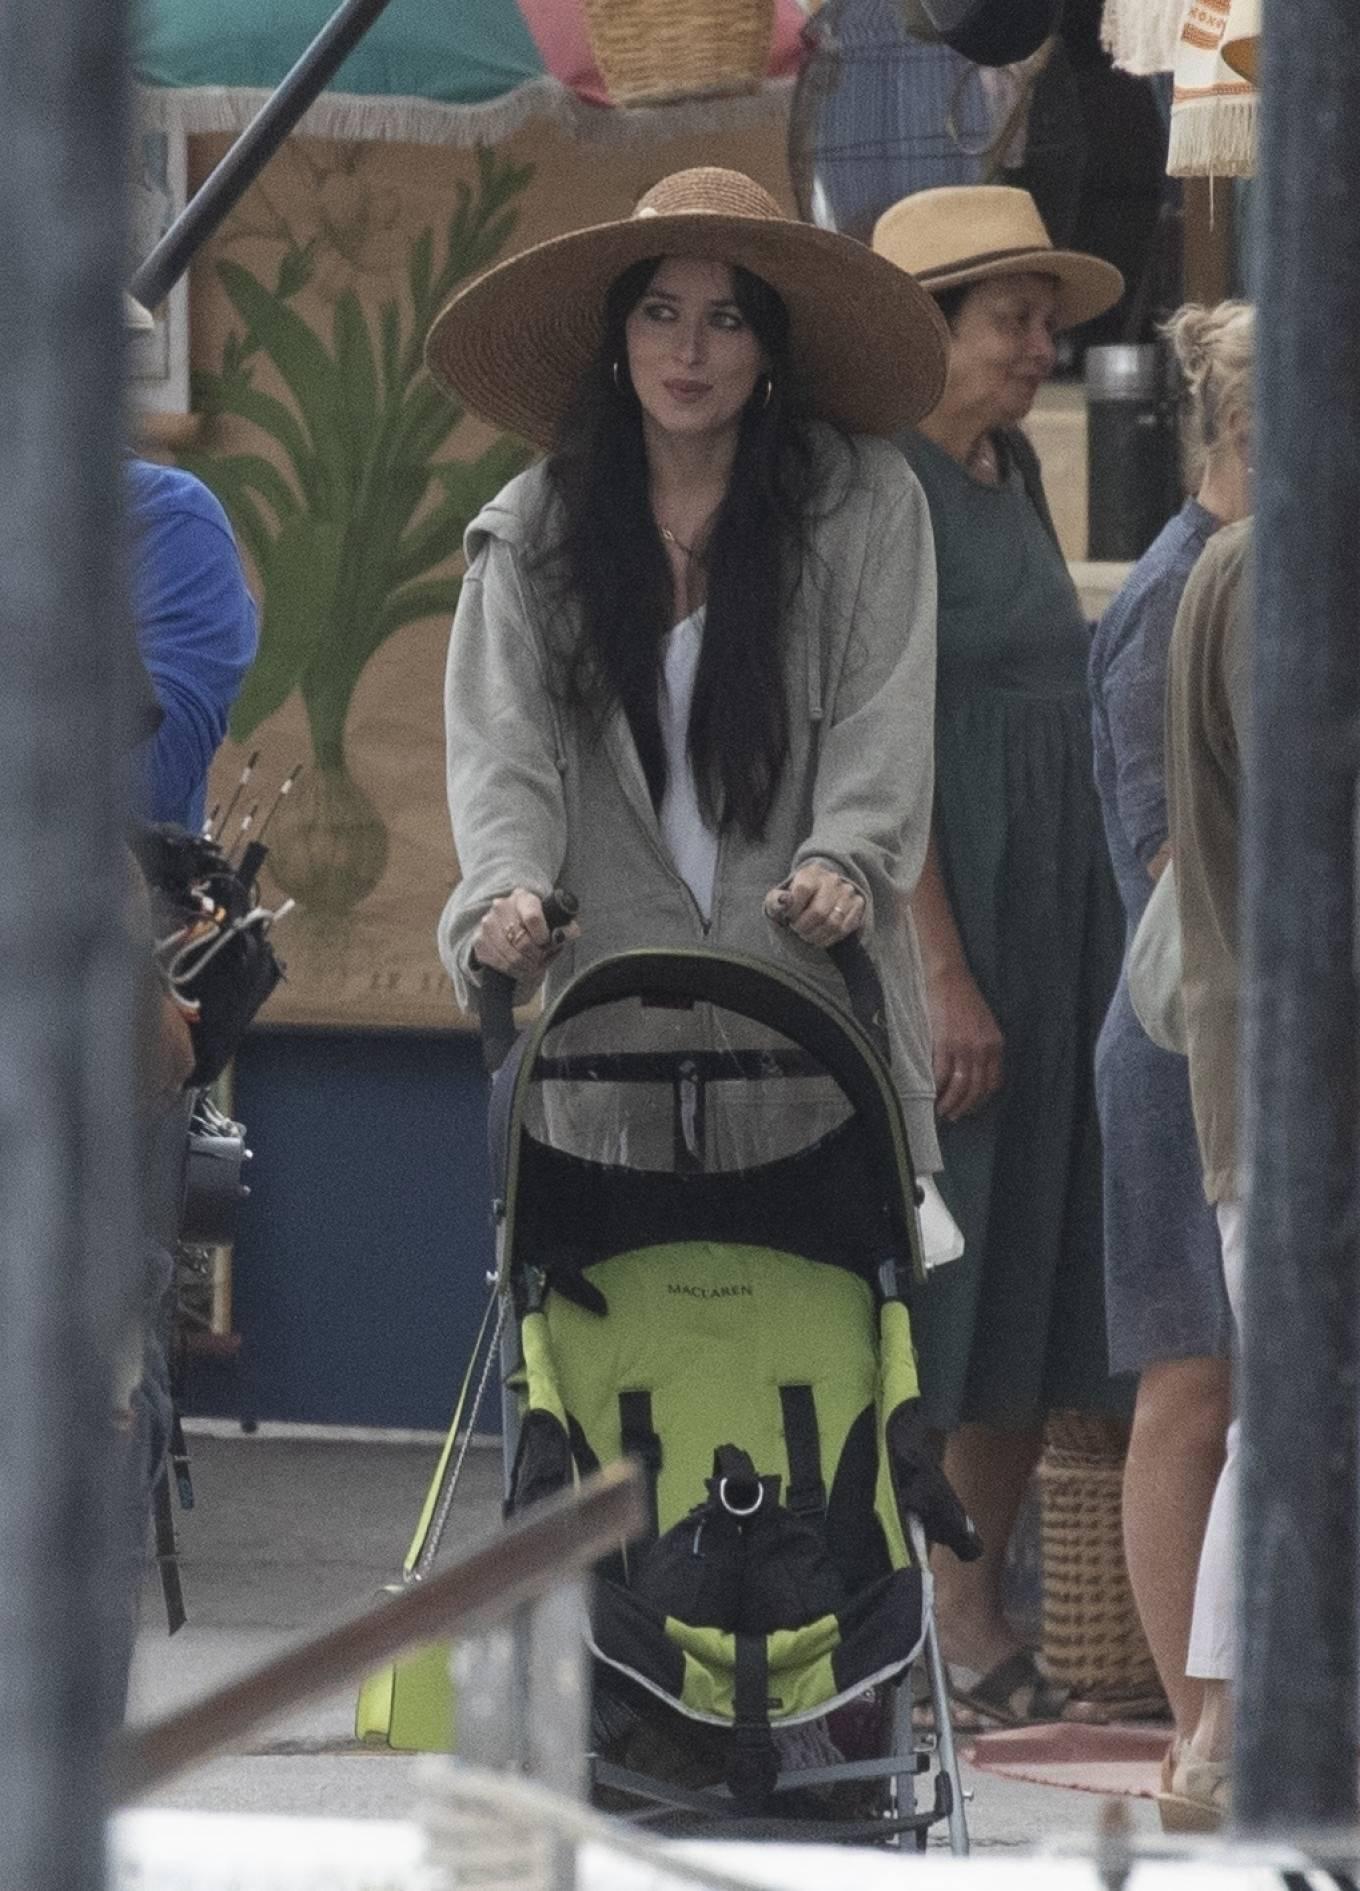 Dakota Johnson 2020 : Dakota Johnson – Filming The Lost Daughter in Speteses Island-18